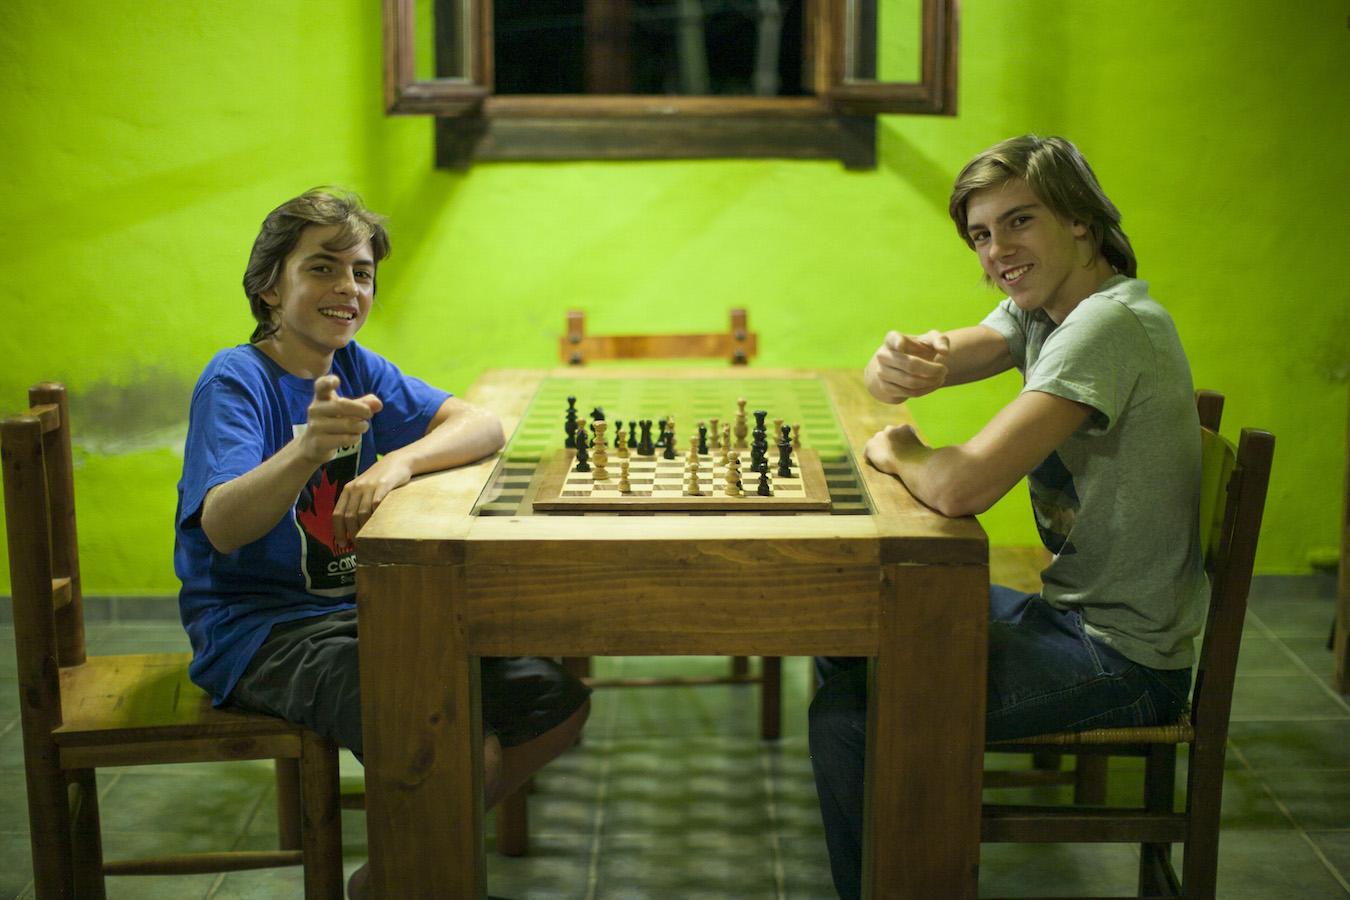 Andoni y Bittor jugando al ajedrez / ©dokumalia